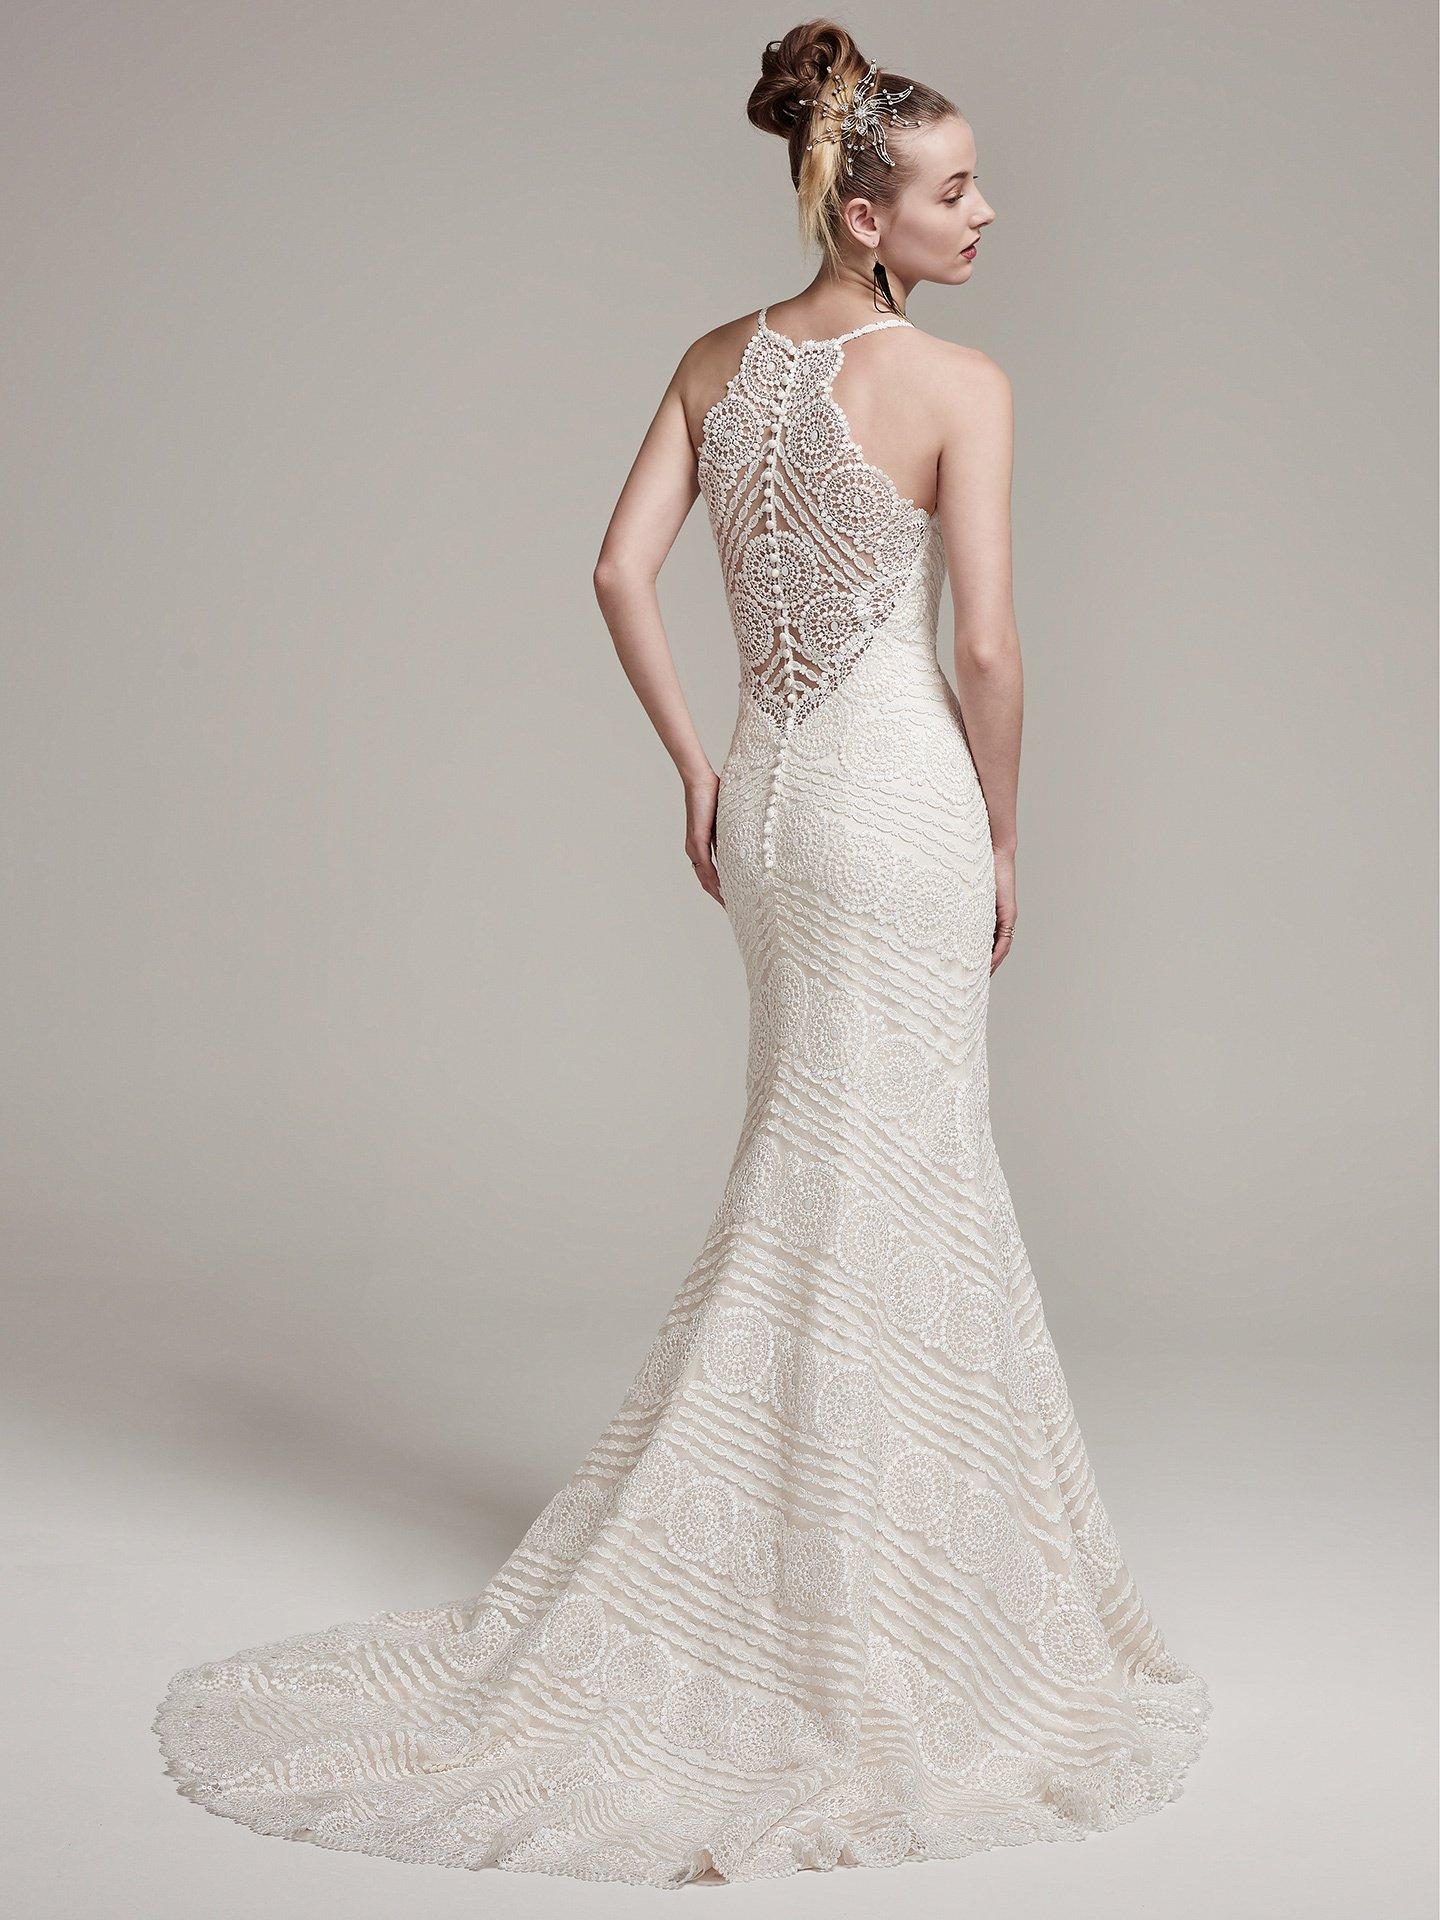 Spaghetti Strap V Neck Sheath Lace Wedding Dress With Back Details